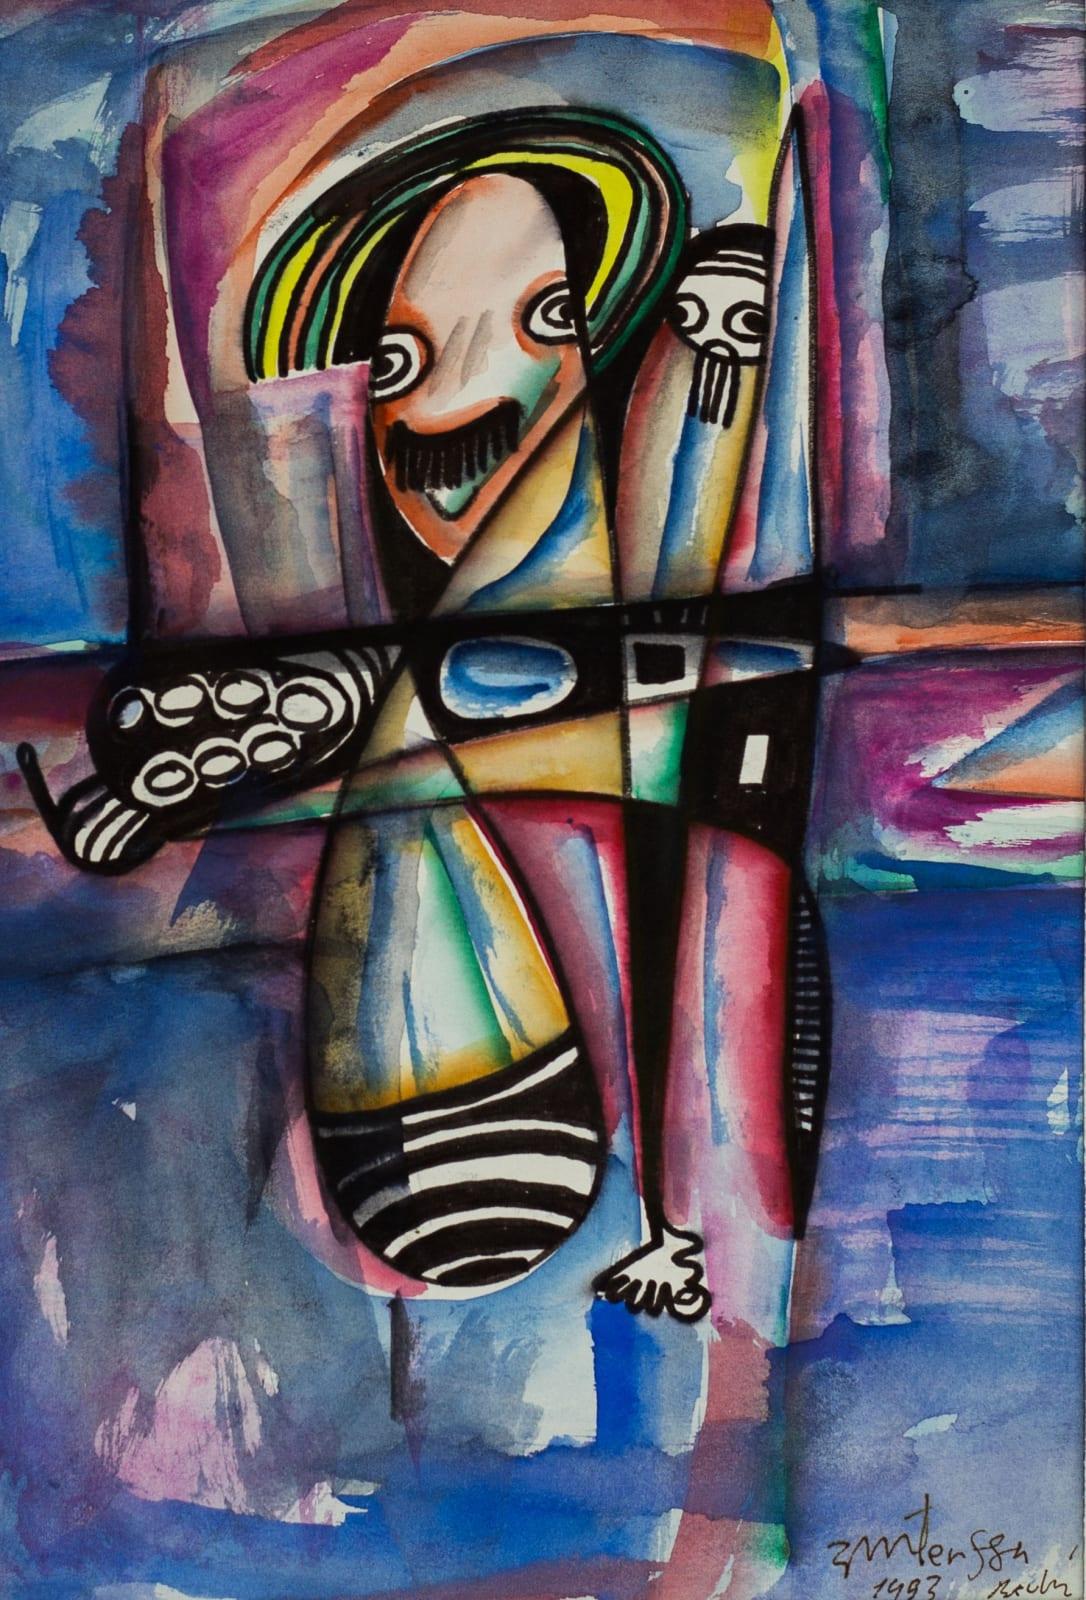 Tibebe Terffa , Untitled on Paper III, 2003